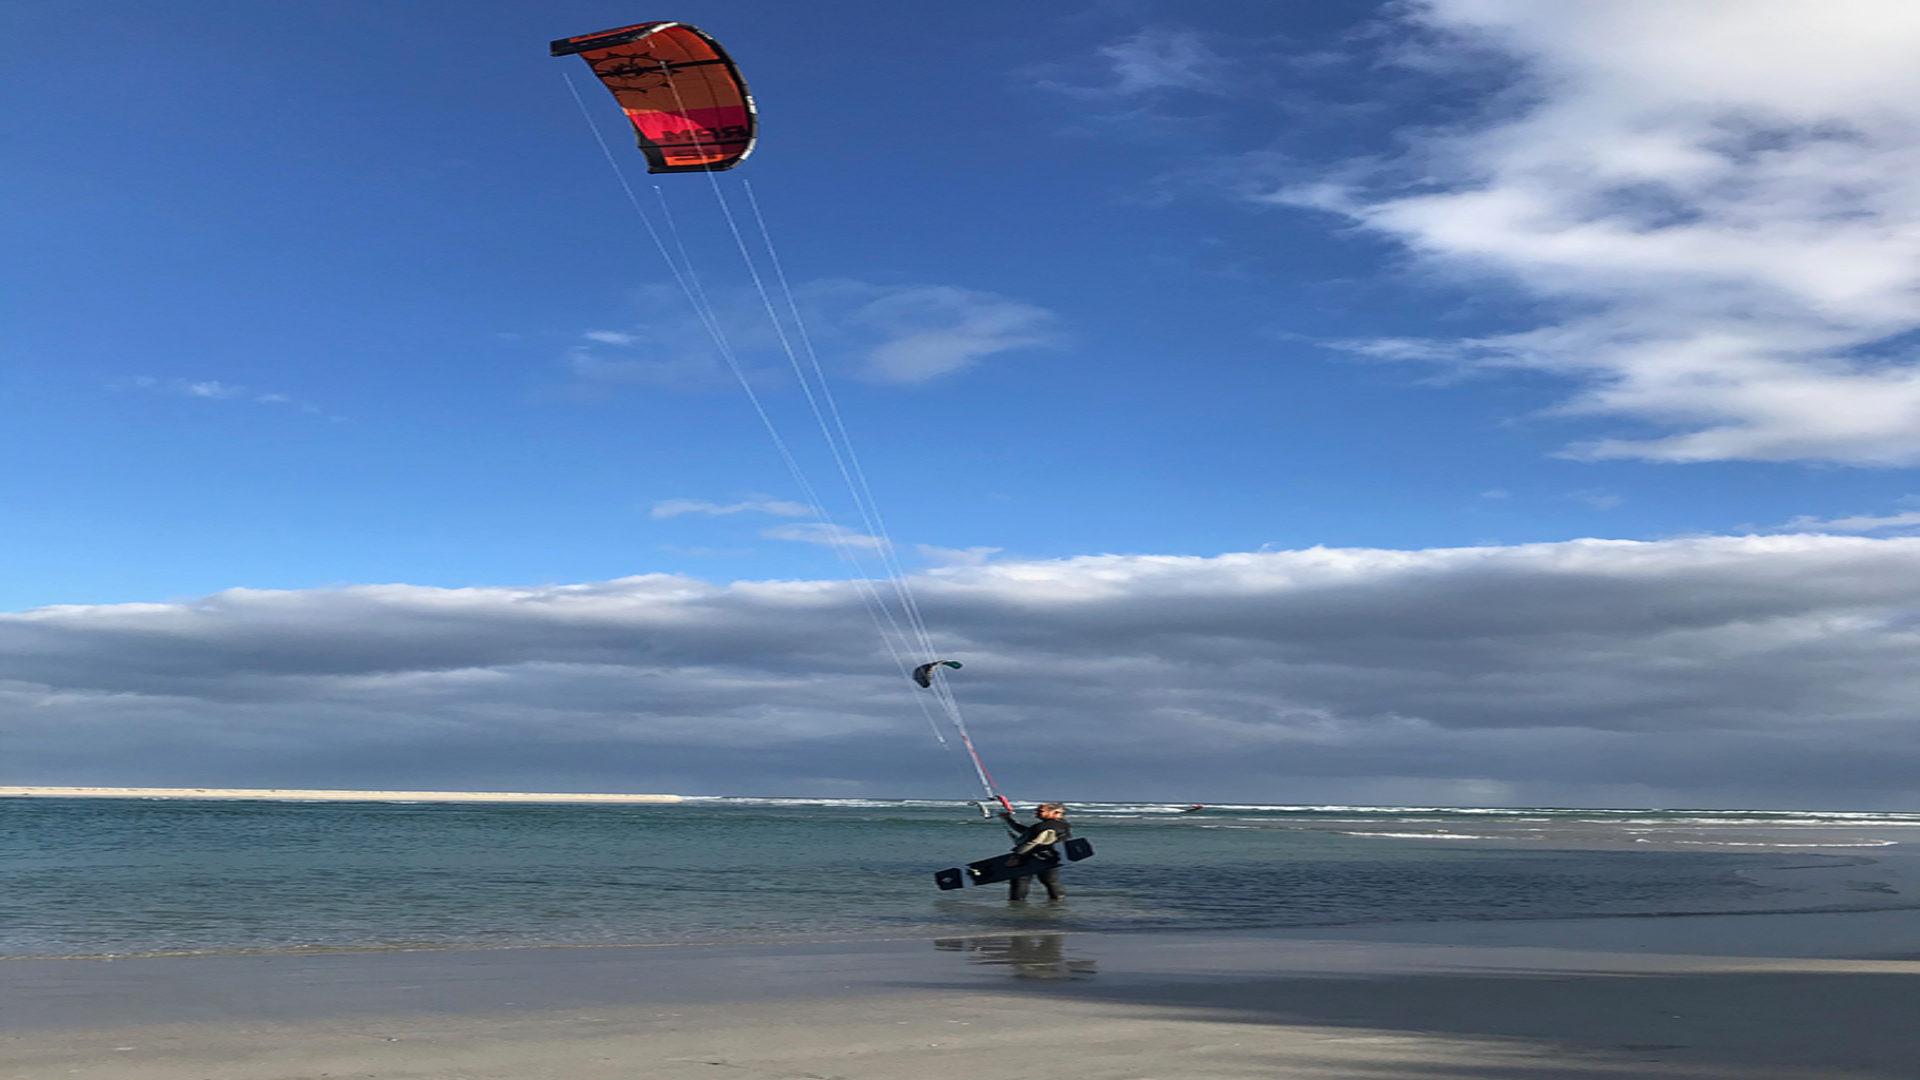 kite-surf-hermanus-surfer-standing-768x1024